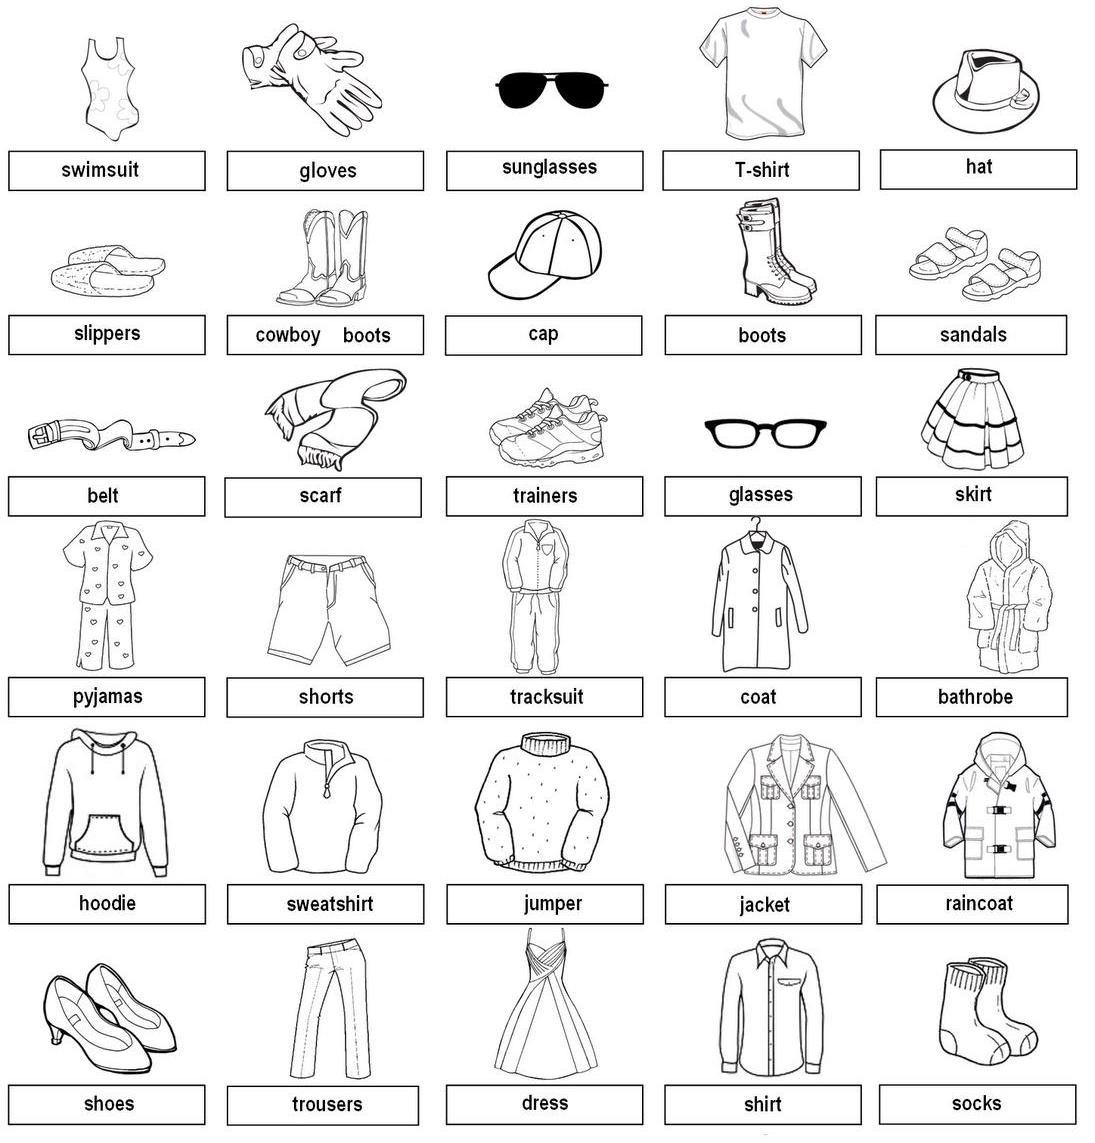 Diario On Line Clothes